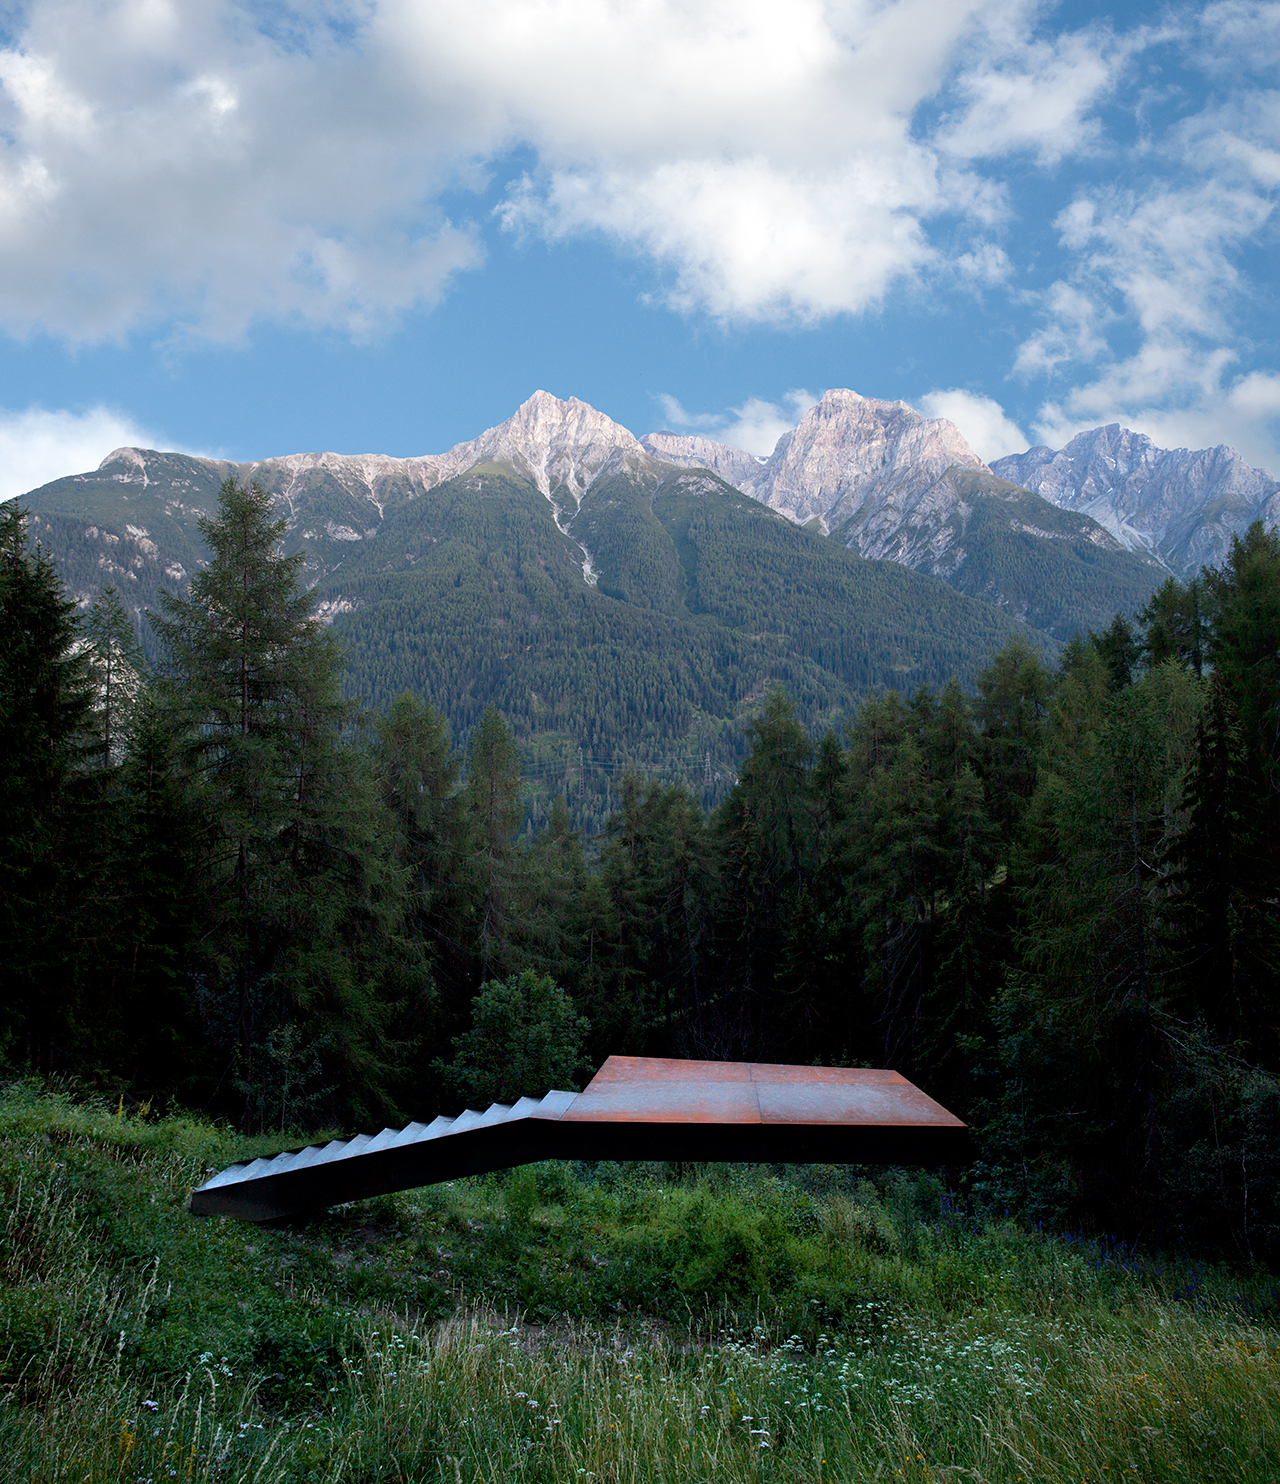 Not Vital, Büna libra (2011), Fundaziun Not Vital, Switzerland, © Eric Gregory Powell/Courtesy Fundaziun Not Vital/Outdoor Art, Prestel 2015